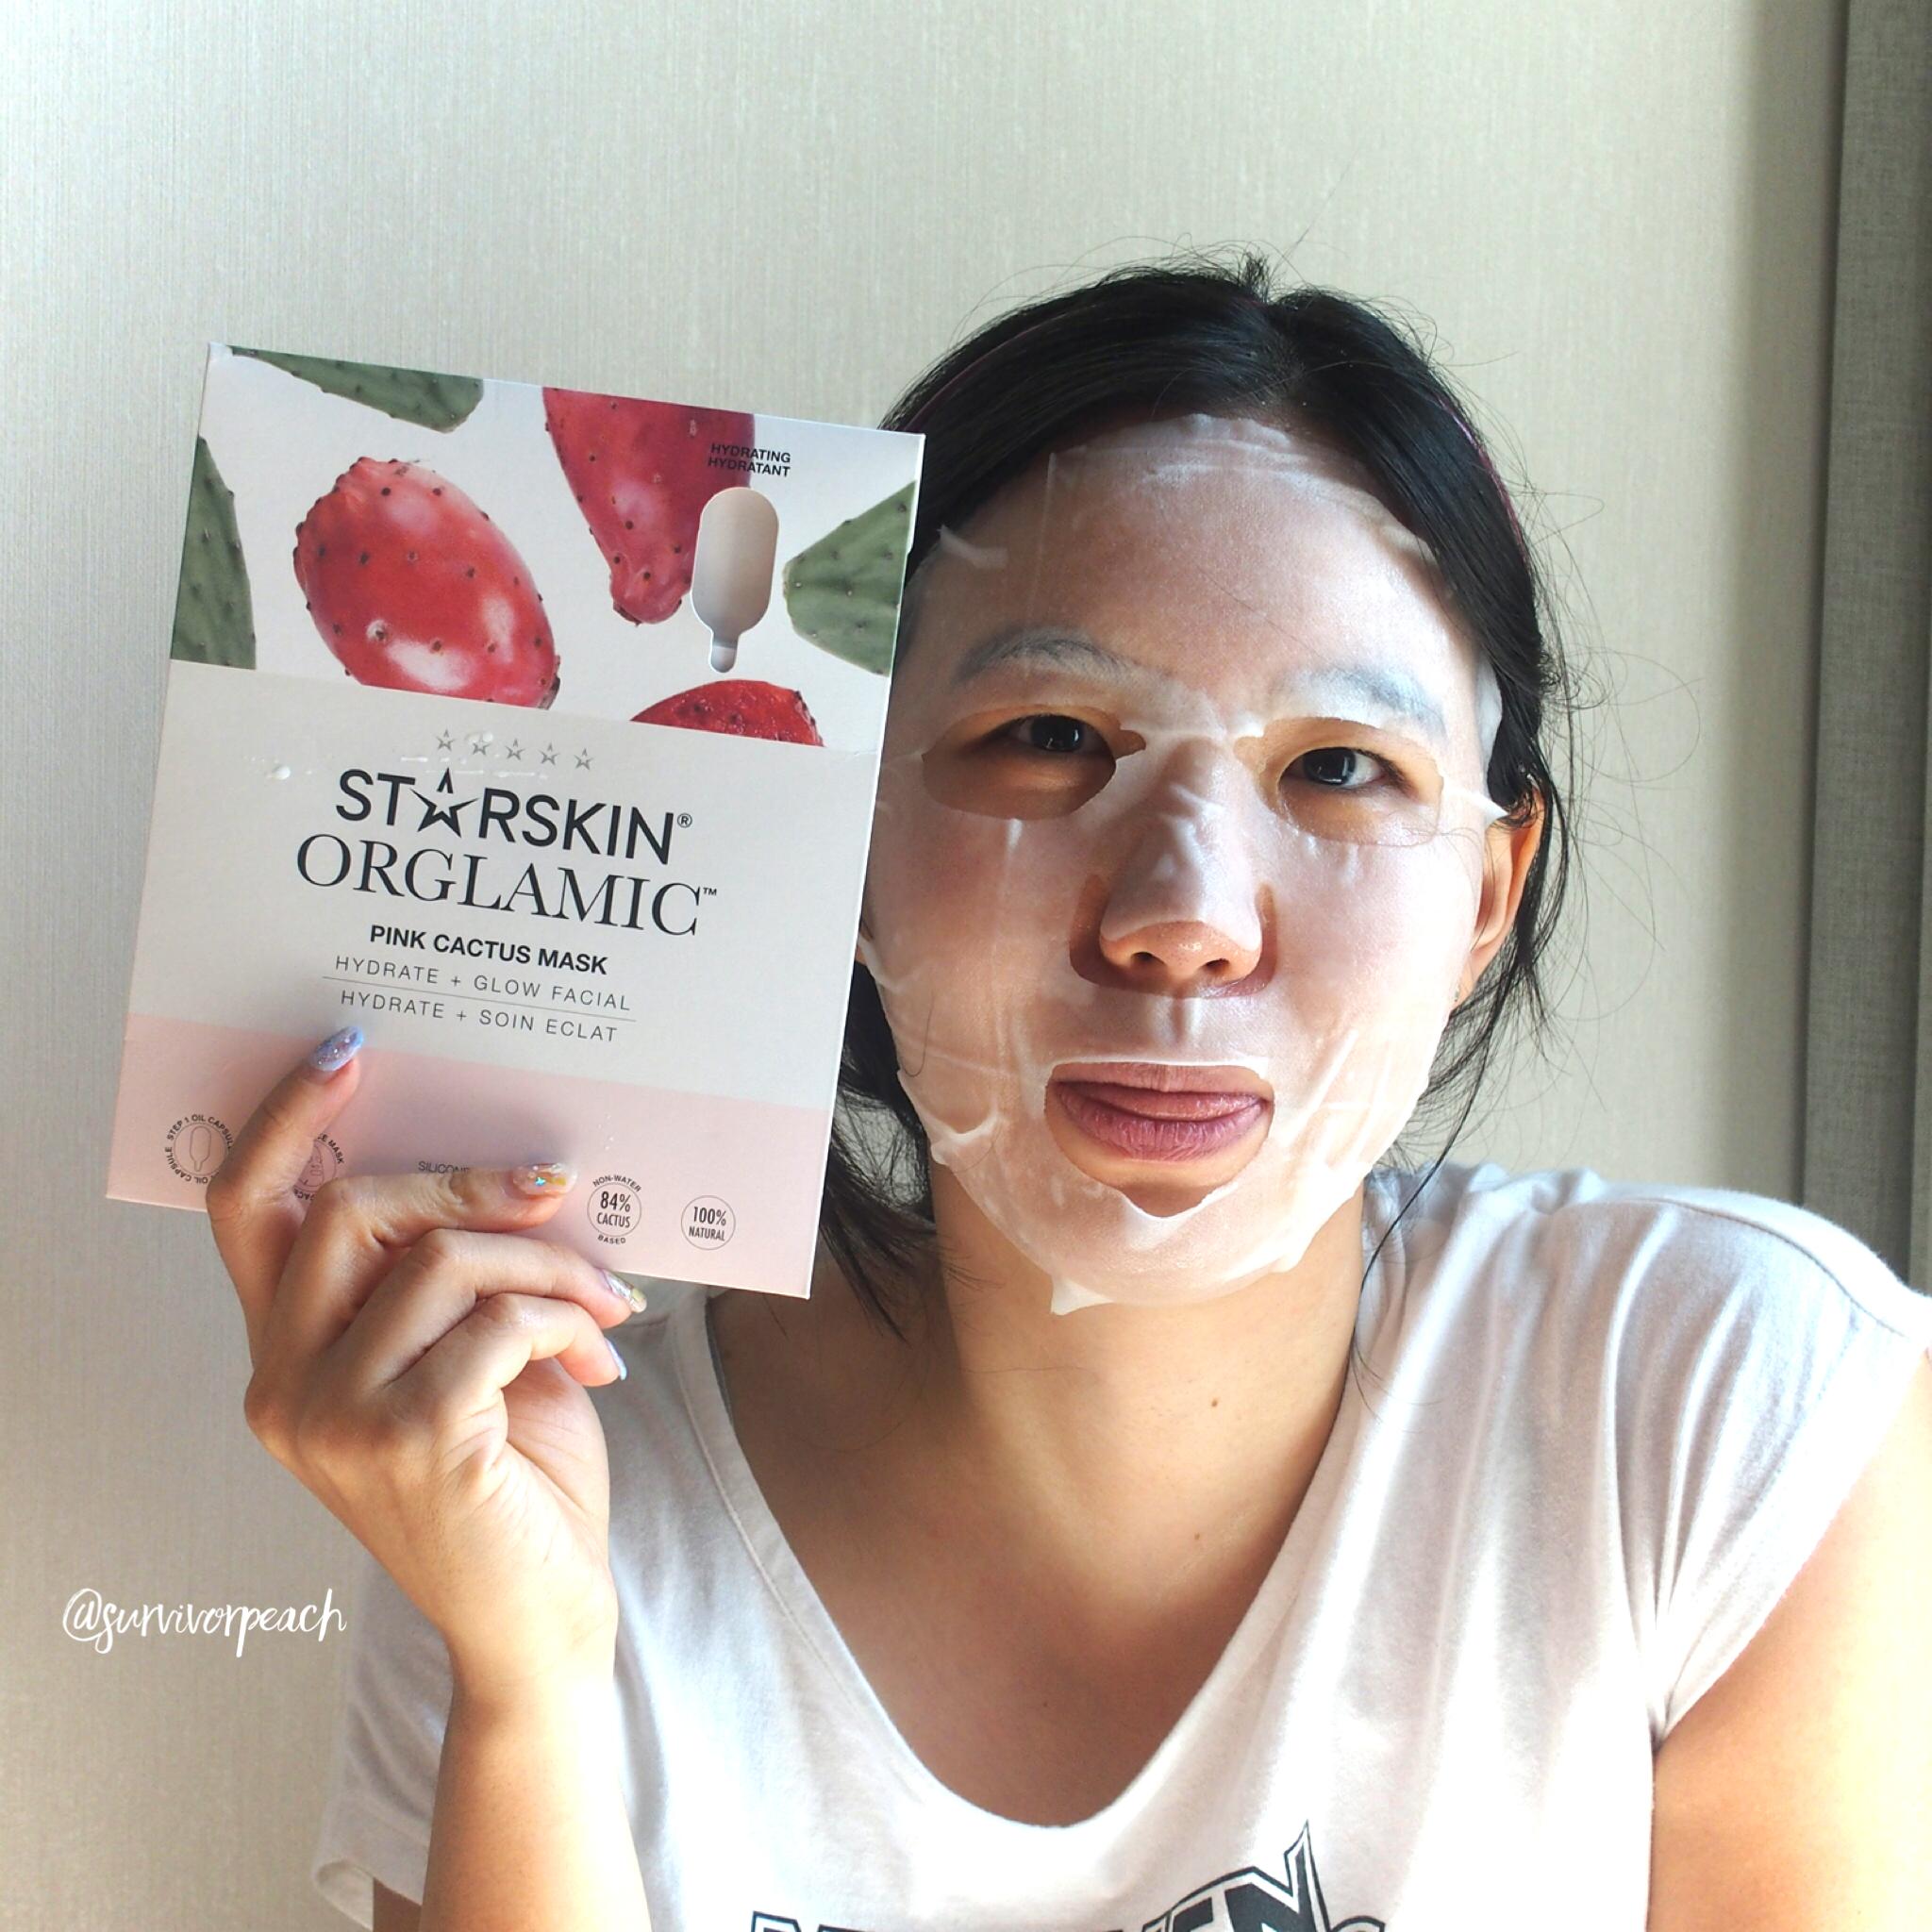 Me wearing the Starskin Orglamic Pink Cactus Oil Mask